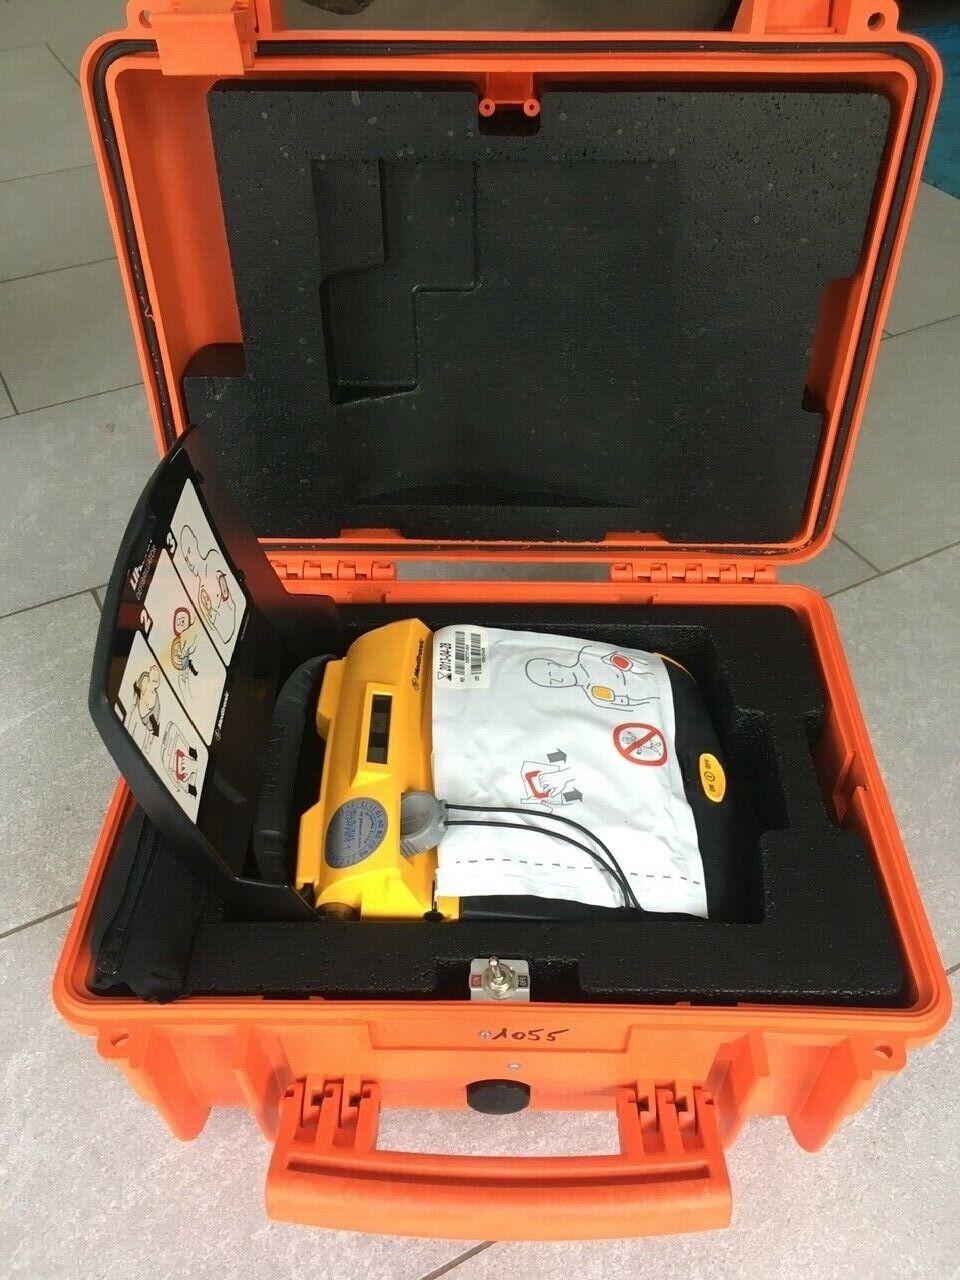 2 Stück: Defibrillator AED Physio Control Lifepak CR Plus